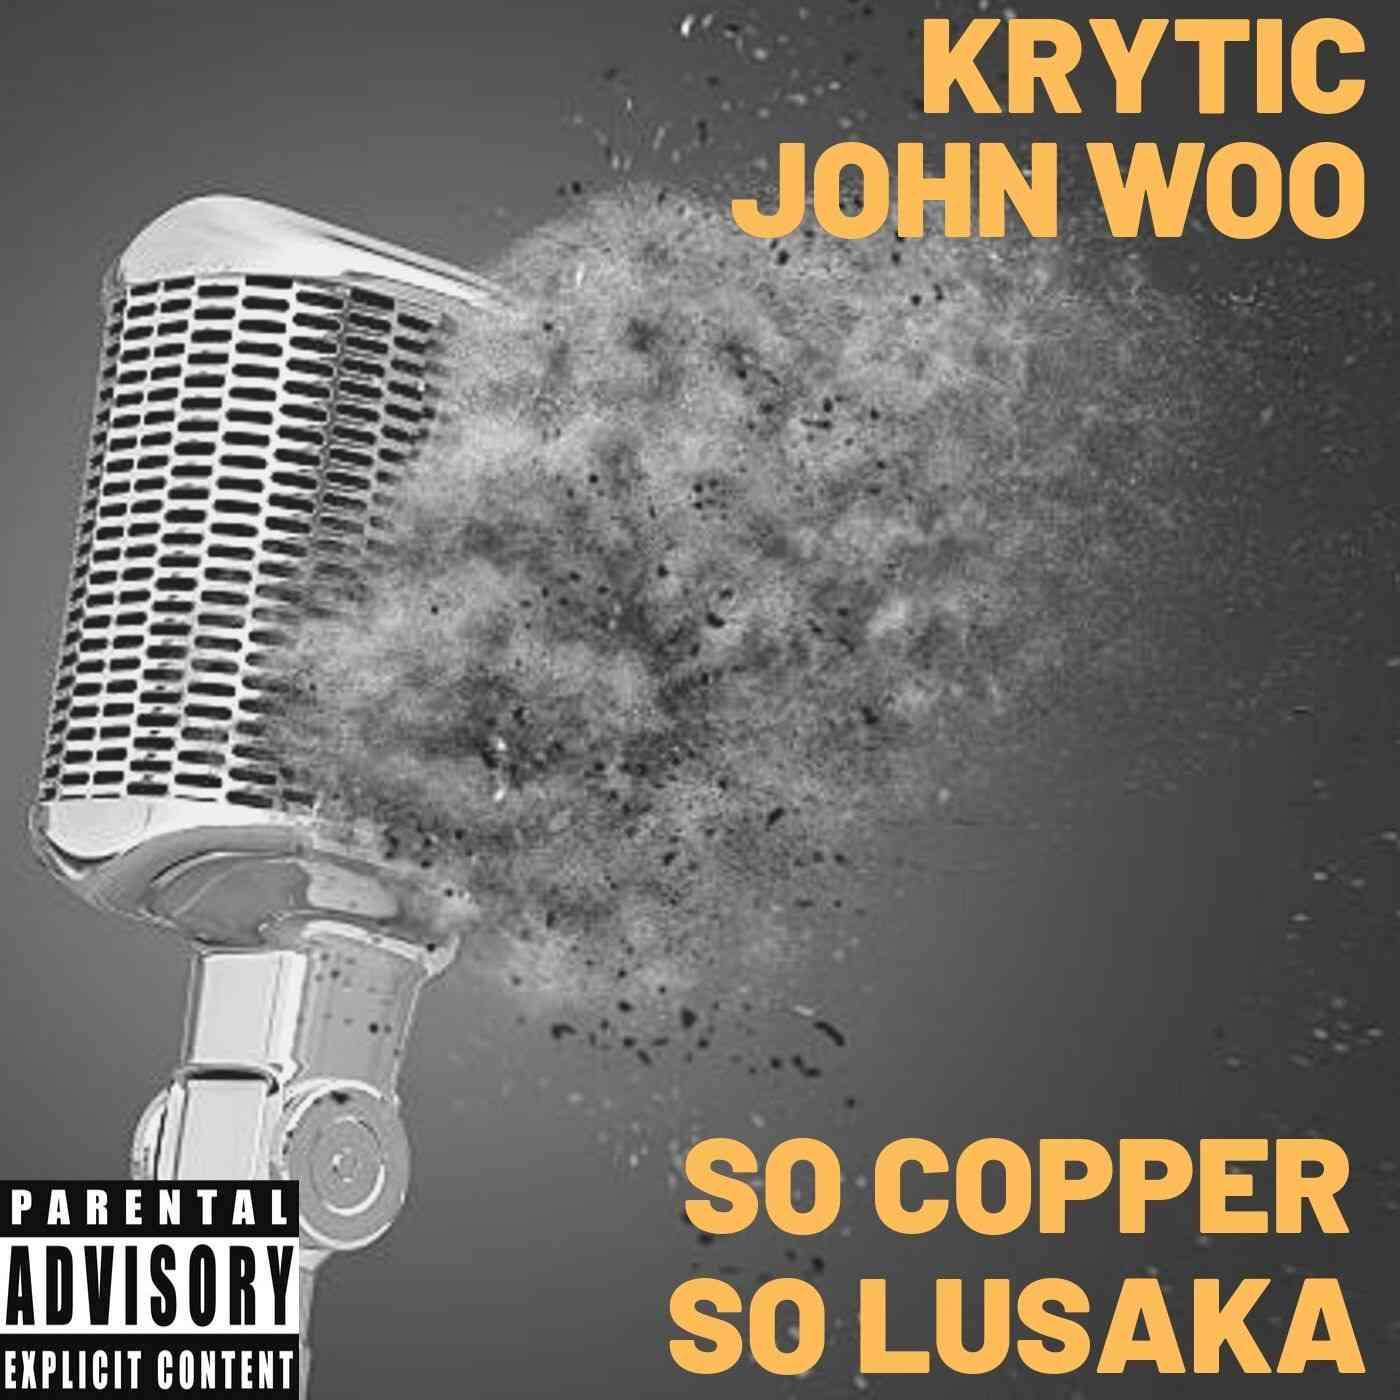 Krytic x Jon Whoo – So Copper, So Lusaka (Prod. By Sir Lex)